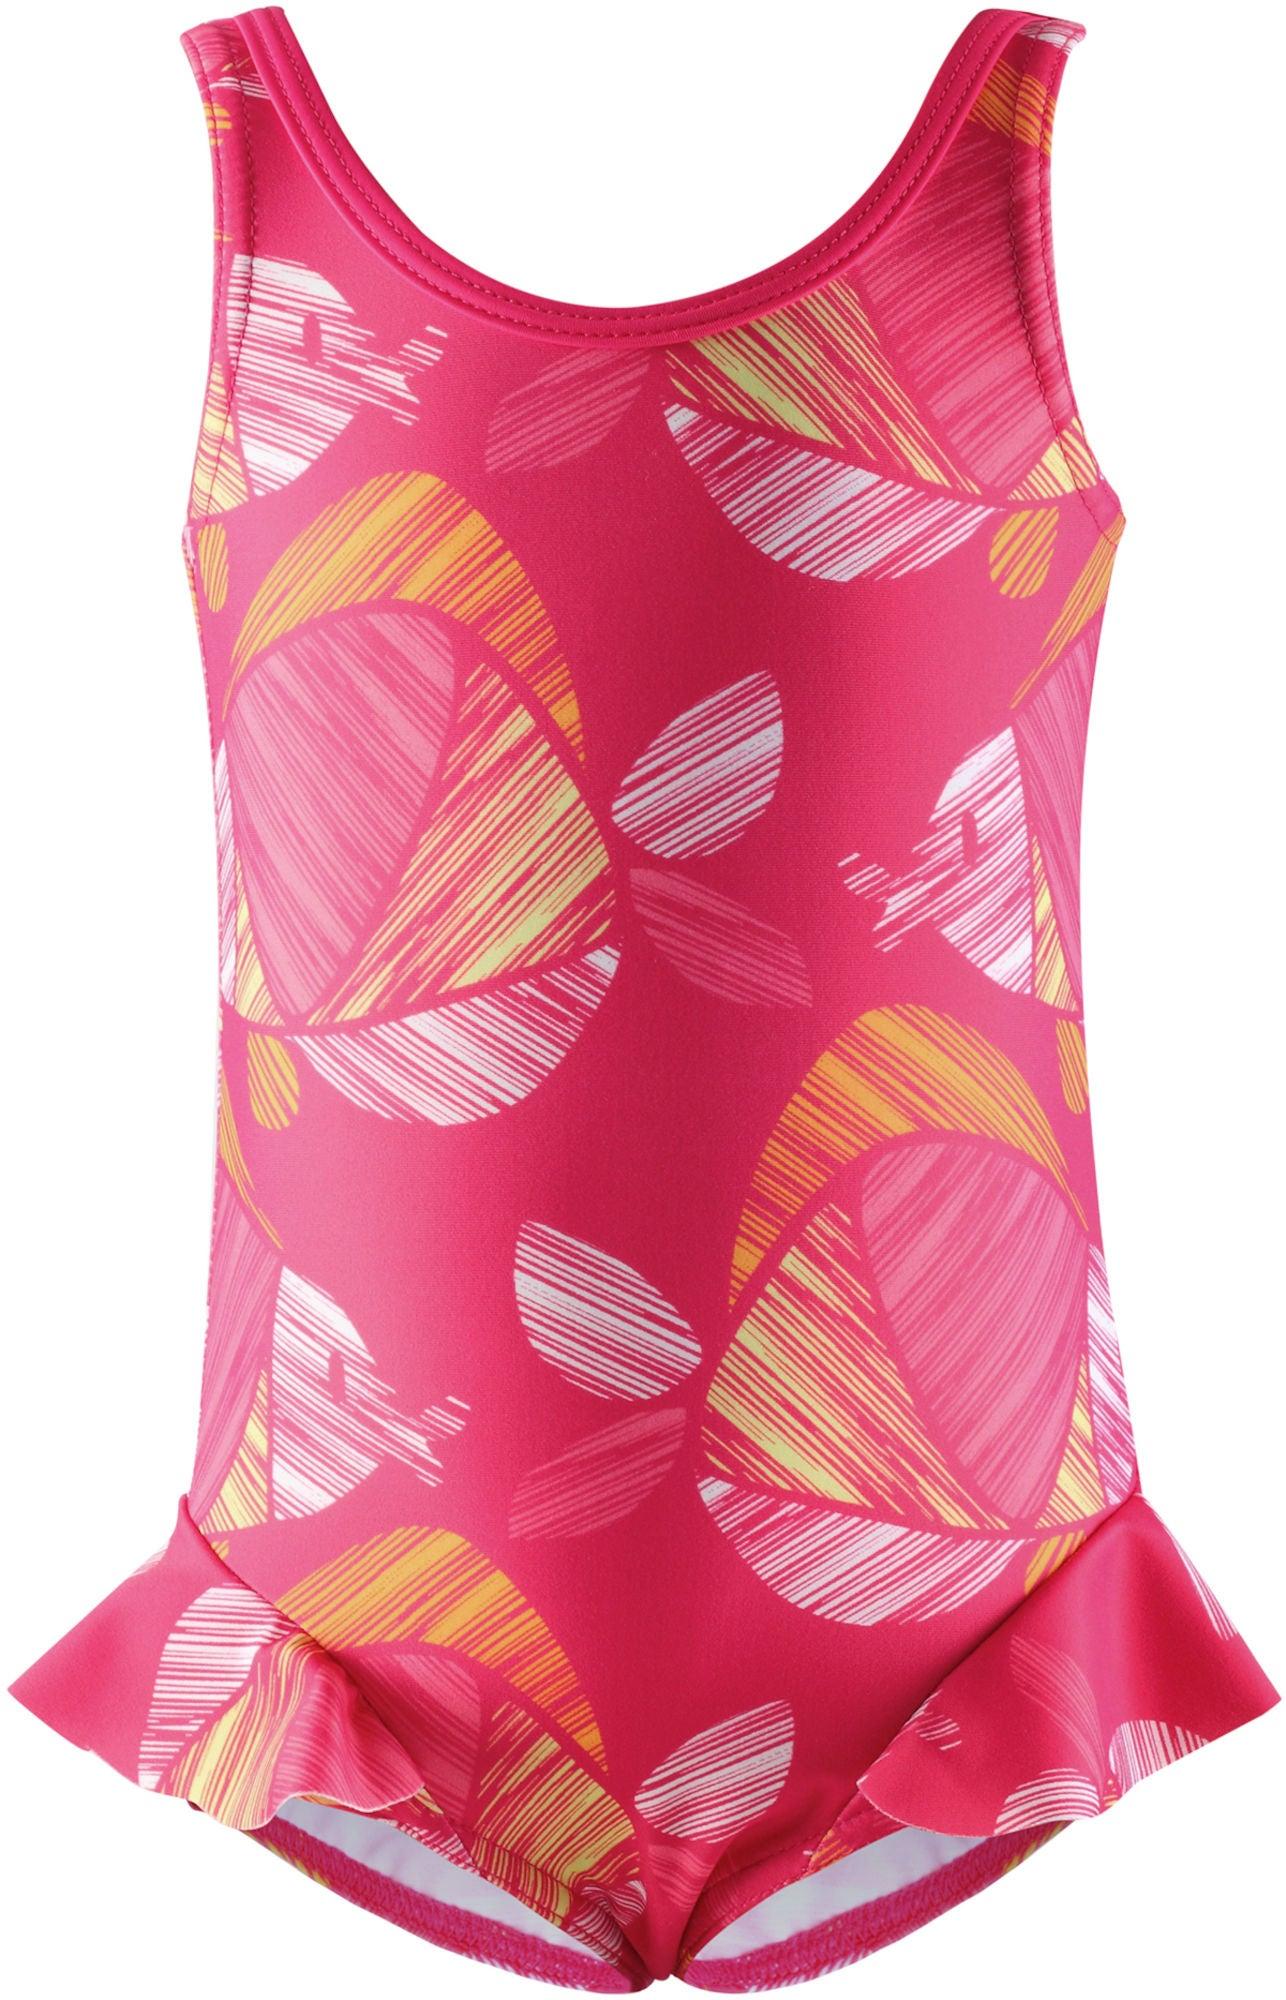 6c247acf108 Køb Reima Corfu Badedragt, Candy Pink   Jollyroom